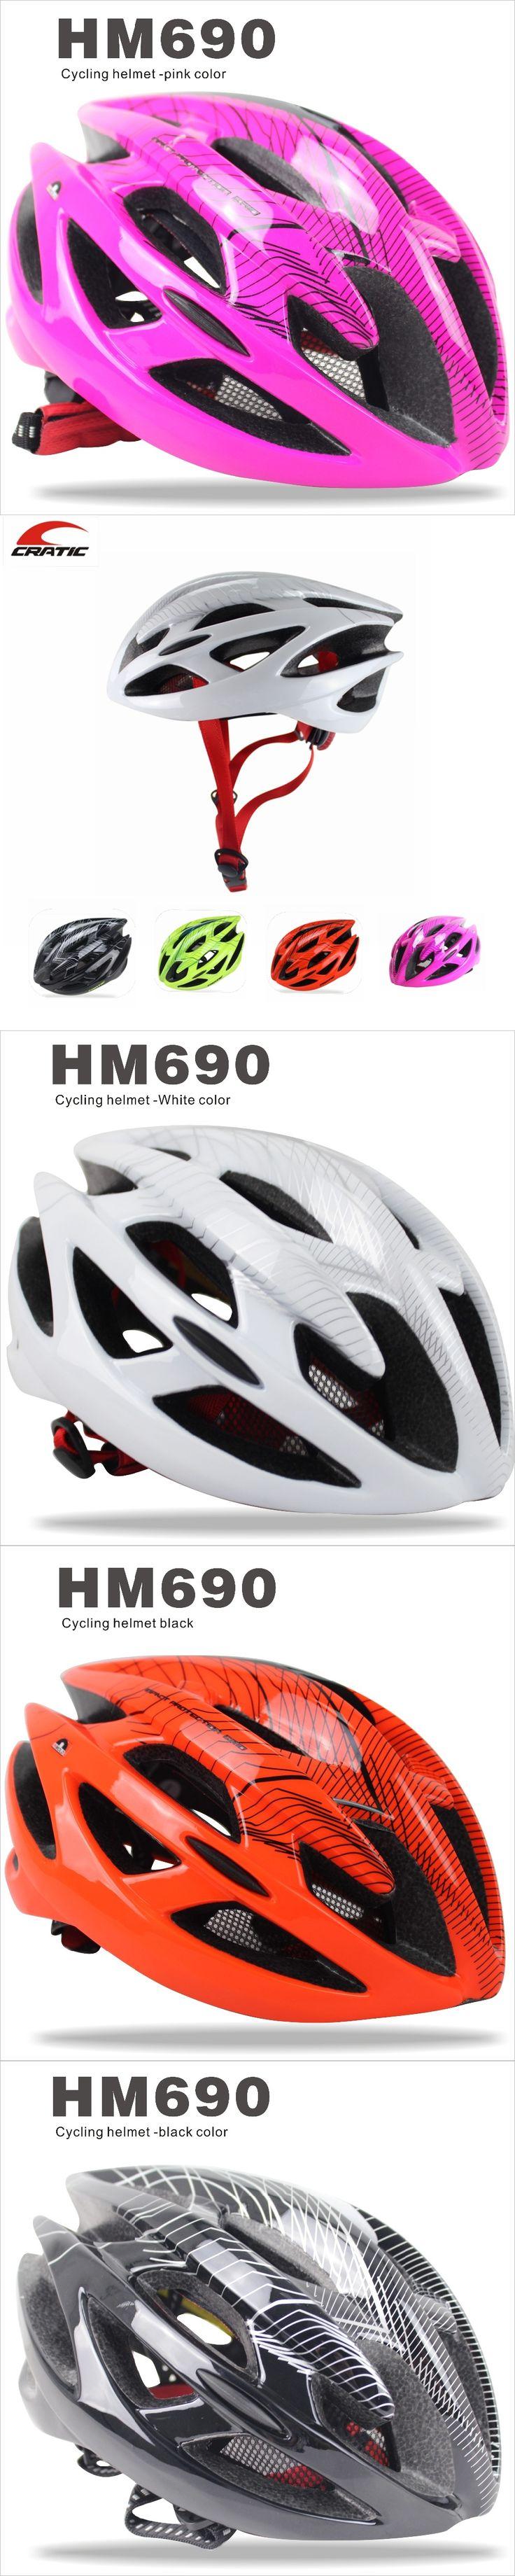 2017 Cycling Helmet Road Mountain Cycle Helmet In-mold Bicycle Helmet Ultralight Bike Helmet Casco Ciclismo M or L